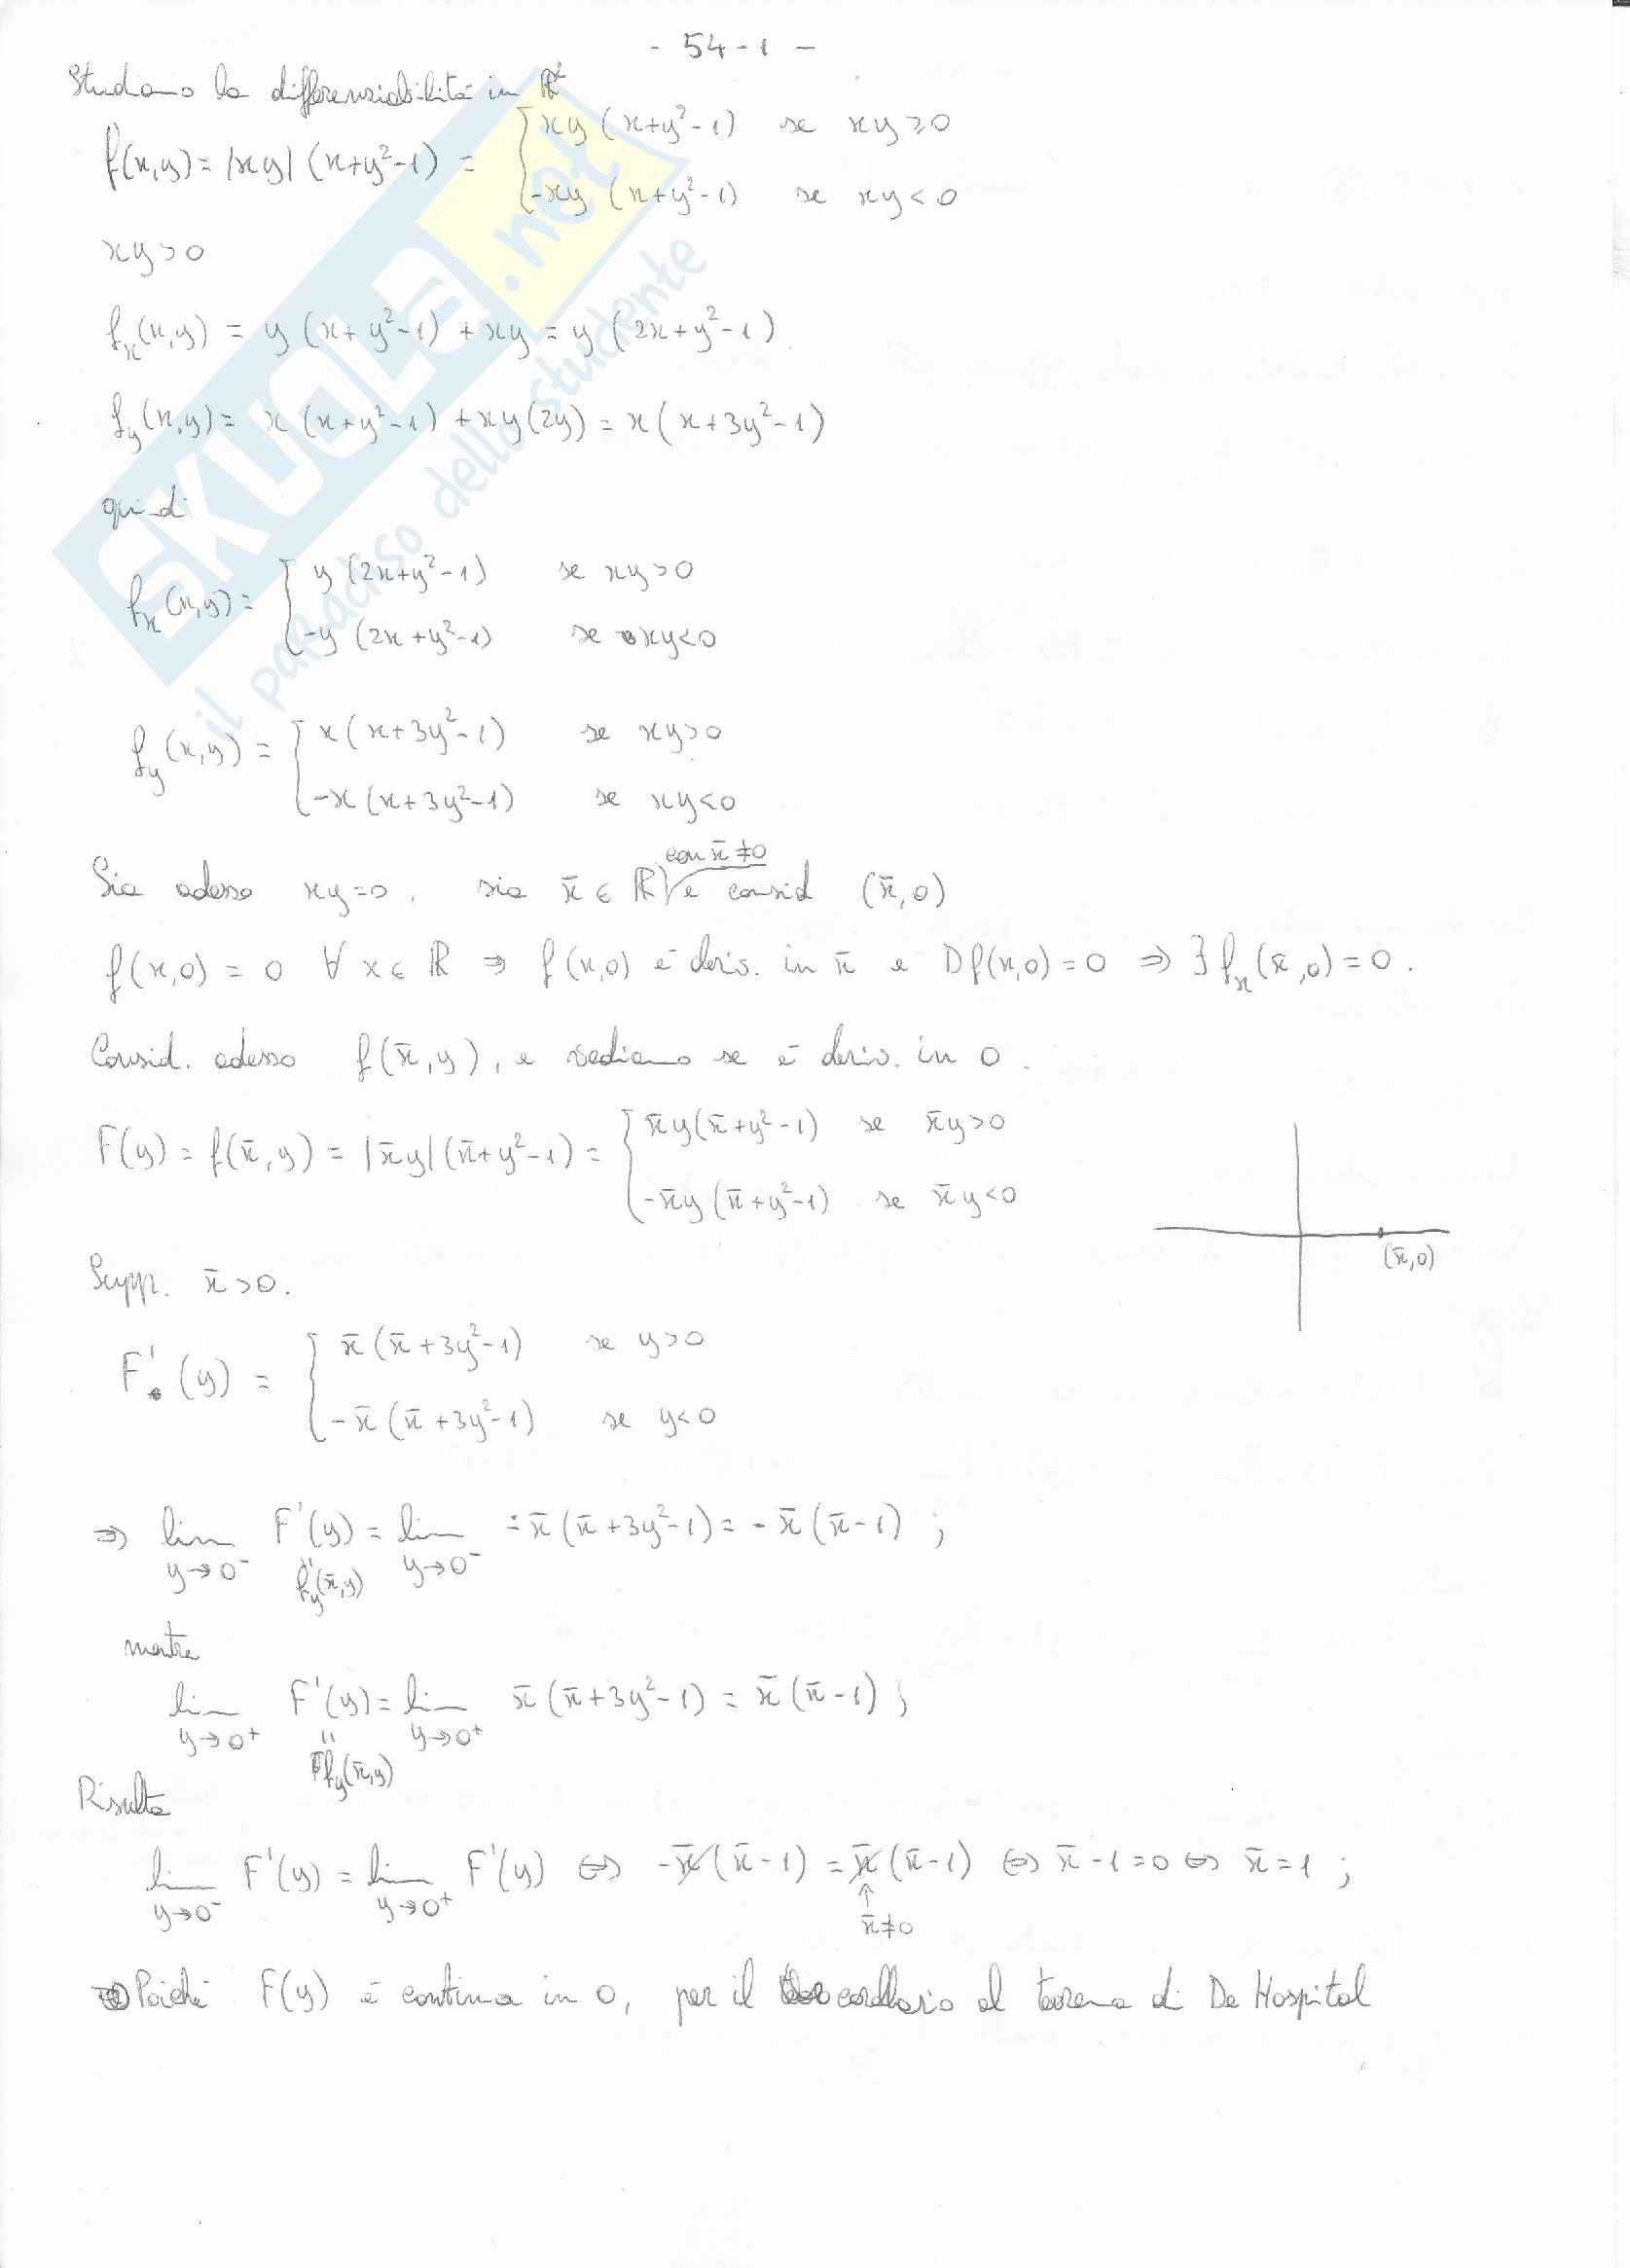 Analisi matematica 2 - esercizi differenziabilità